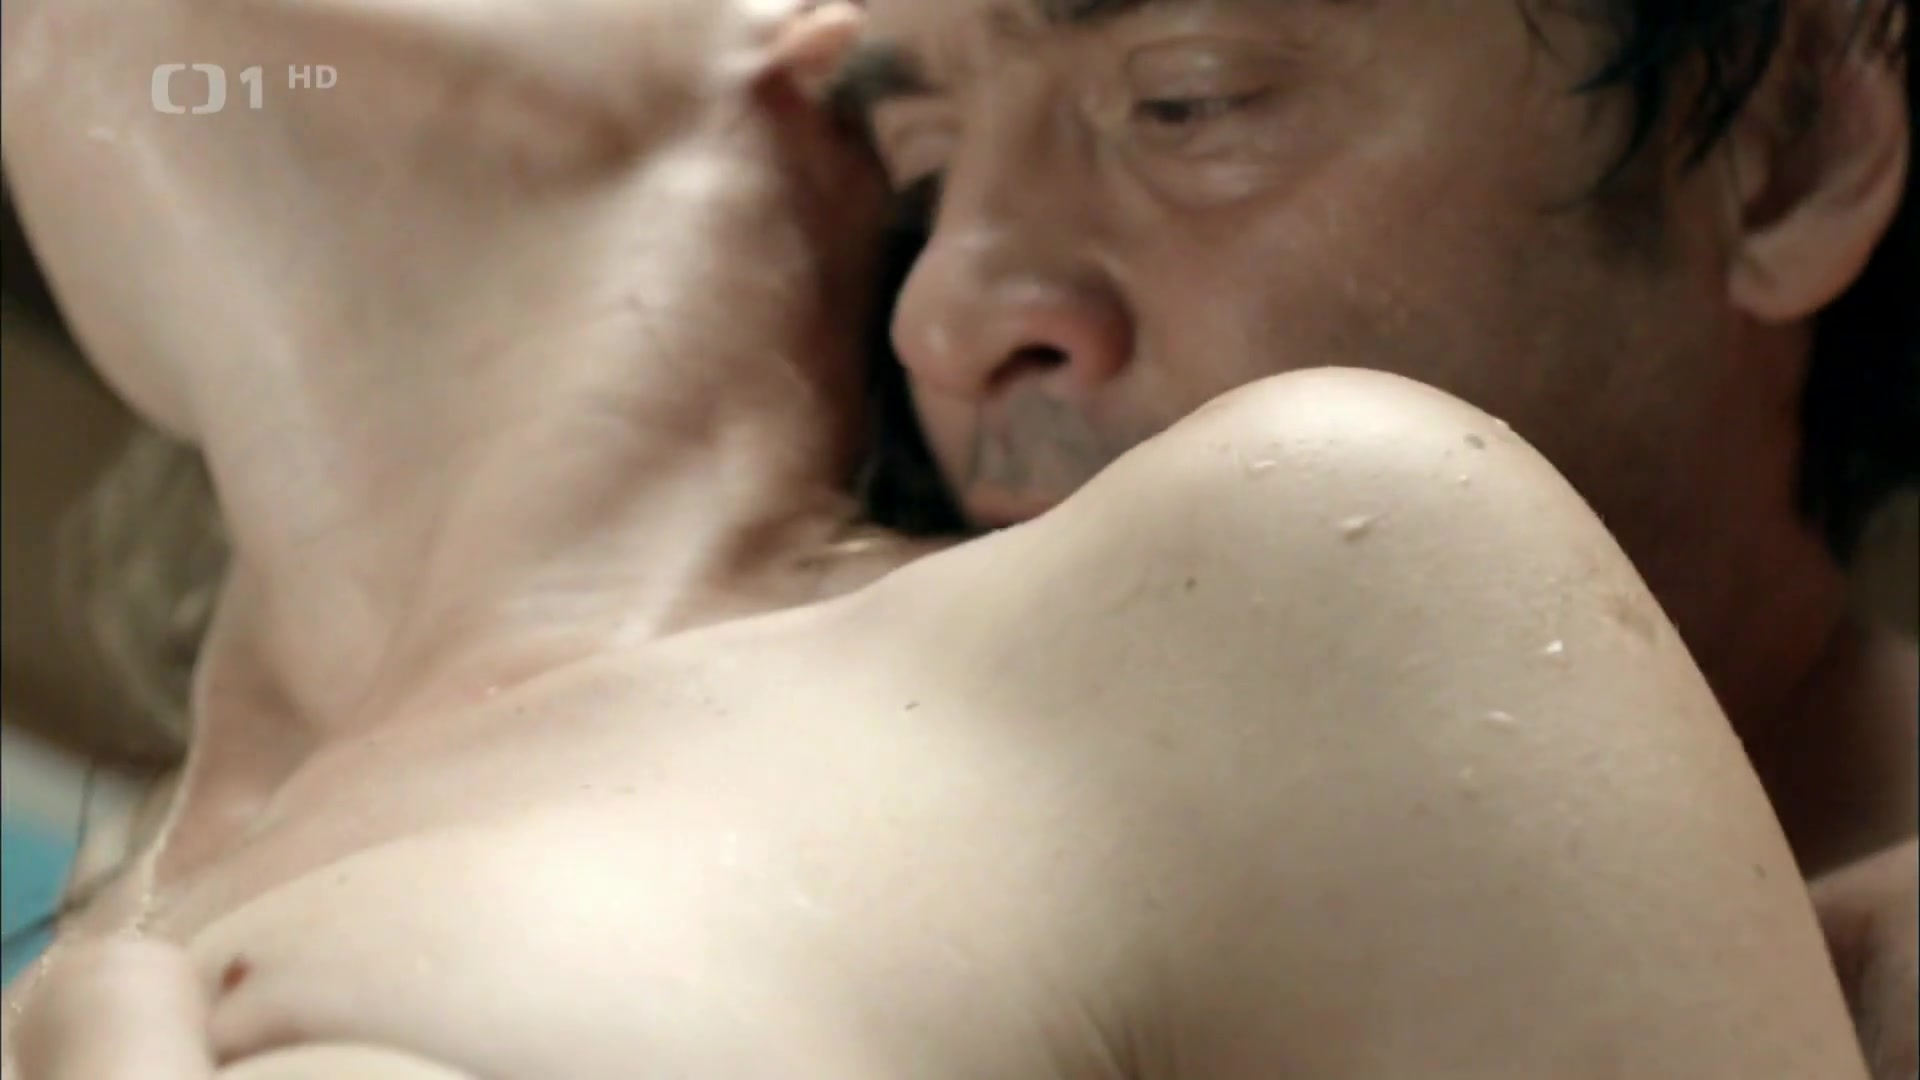 Linda Rybova nude - Skoda lasky s01e03 (2013)